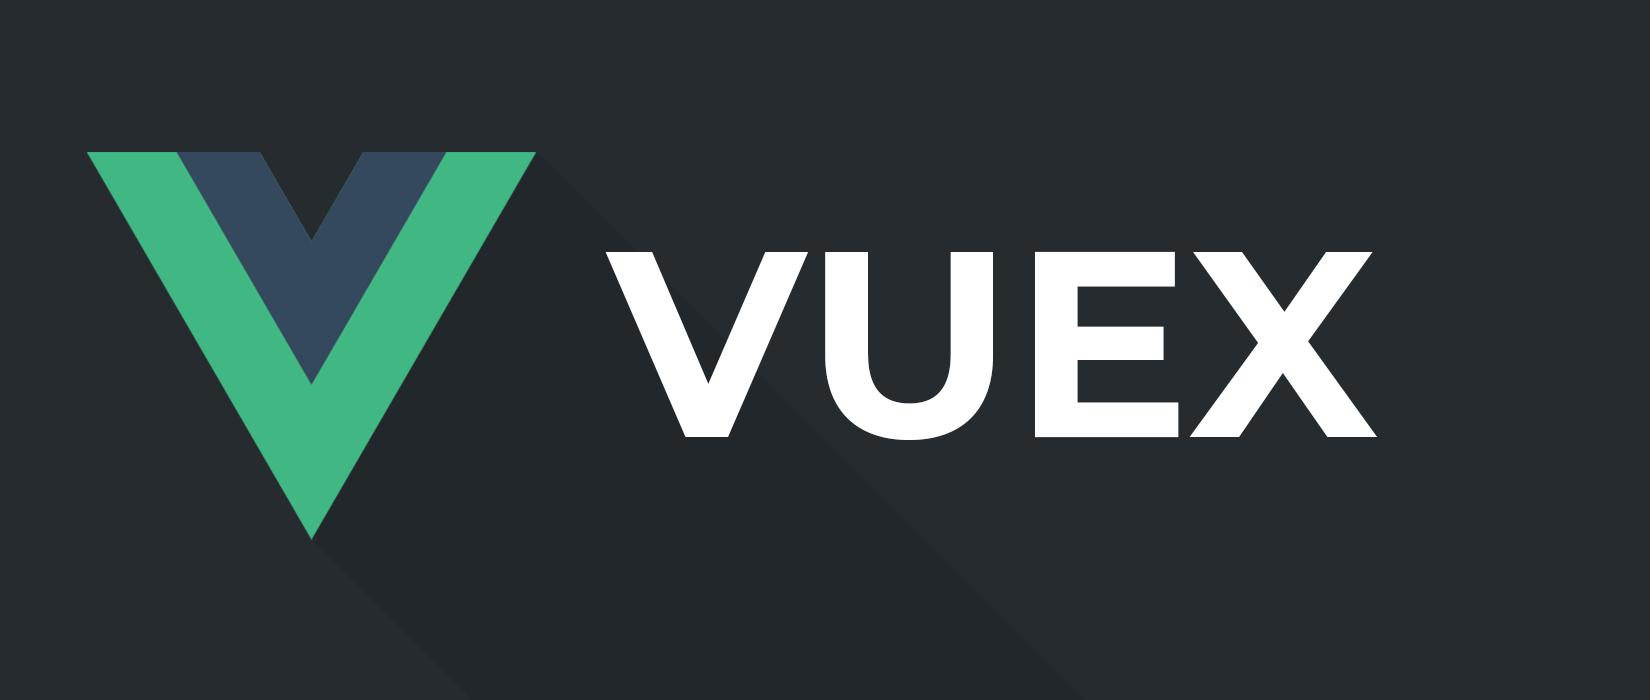 Vuex store state management in vue js